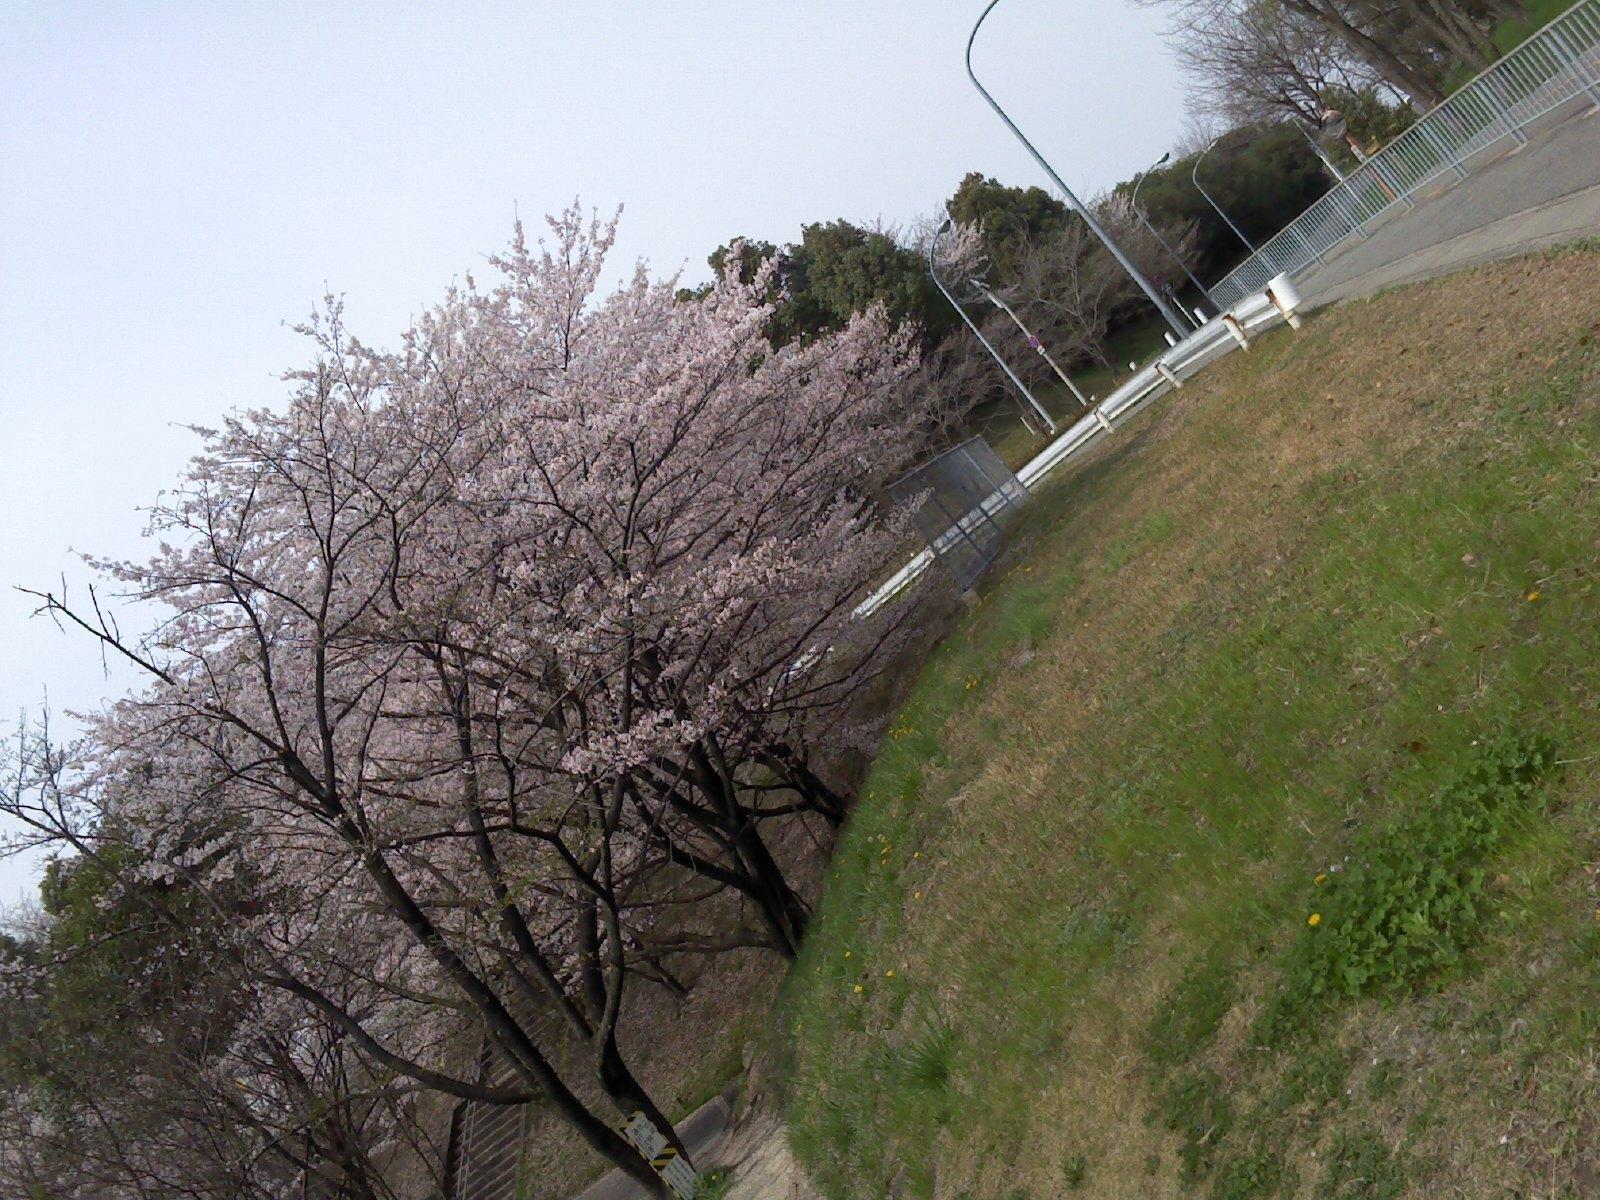 画像20120414 002